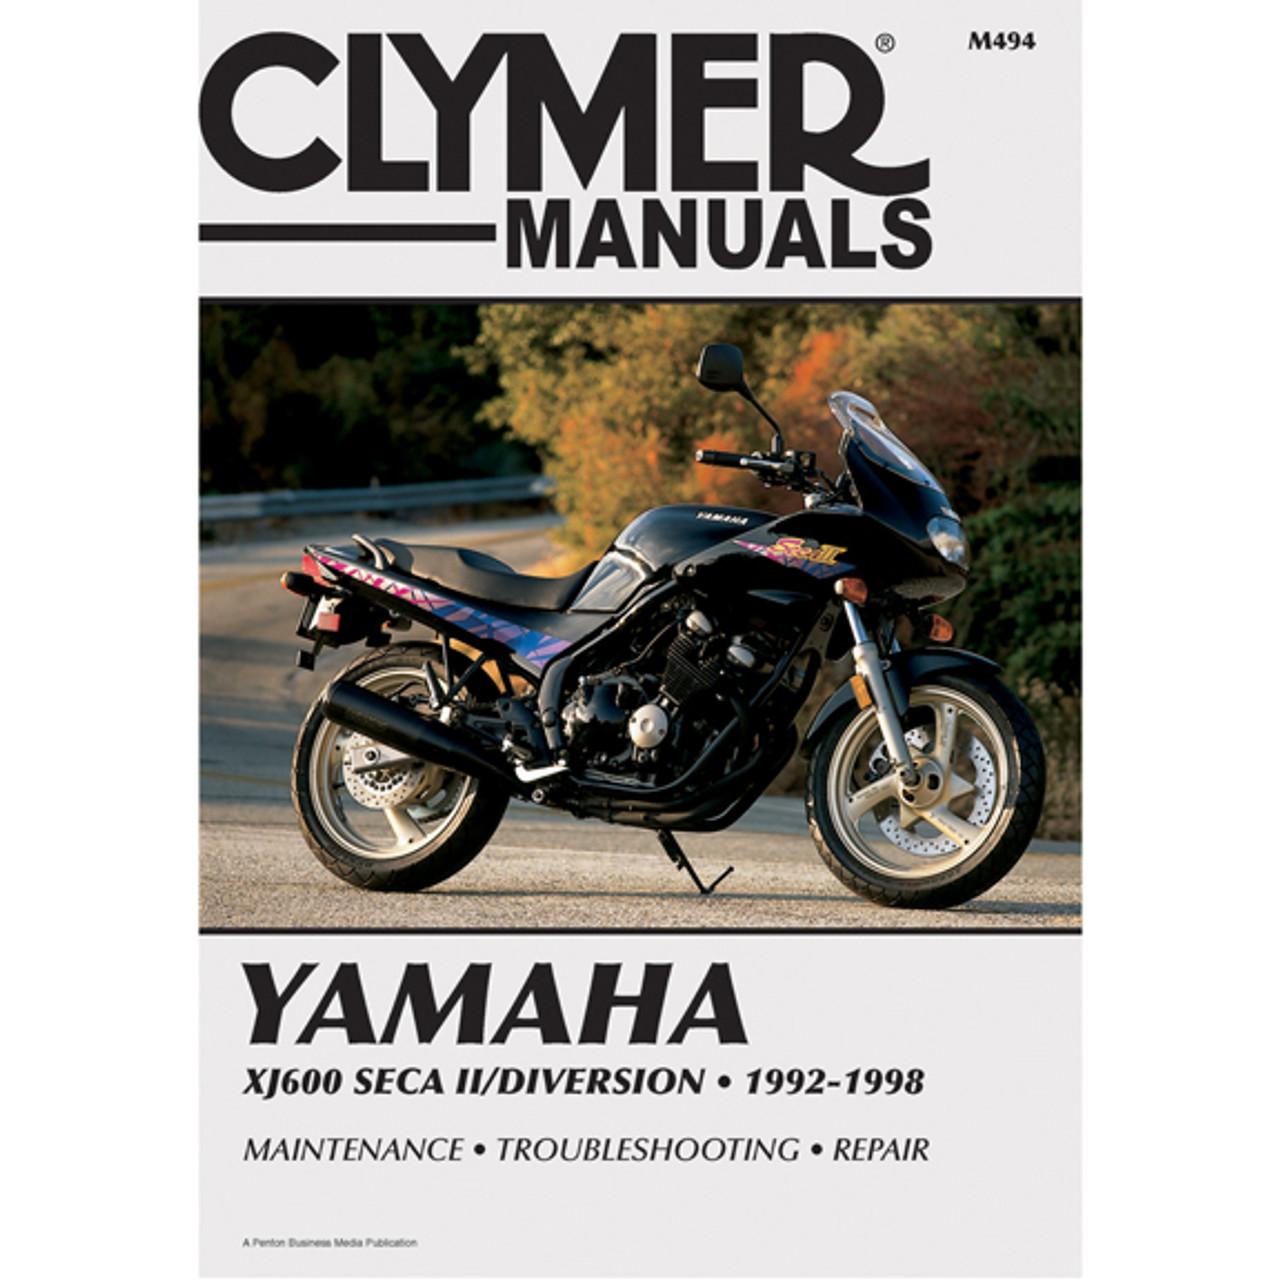 clymer m494 service shop repair manual yamaha xj600 seca ii 92 98 rh speedaddicts com Yamaha XJ600 Parts Moto Yamaha XJ 600